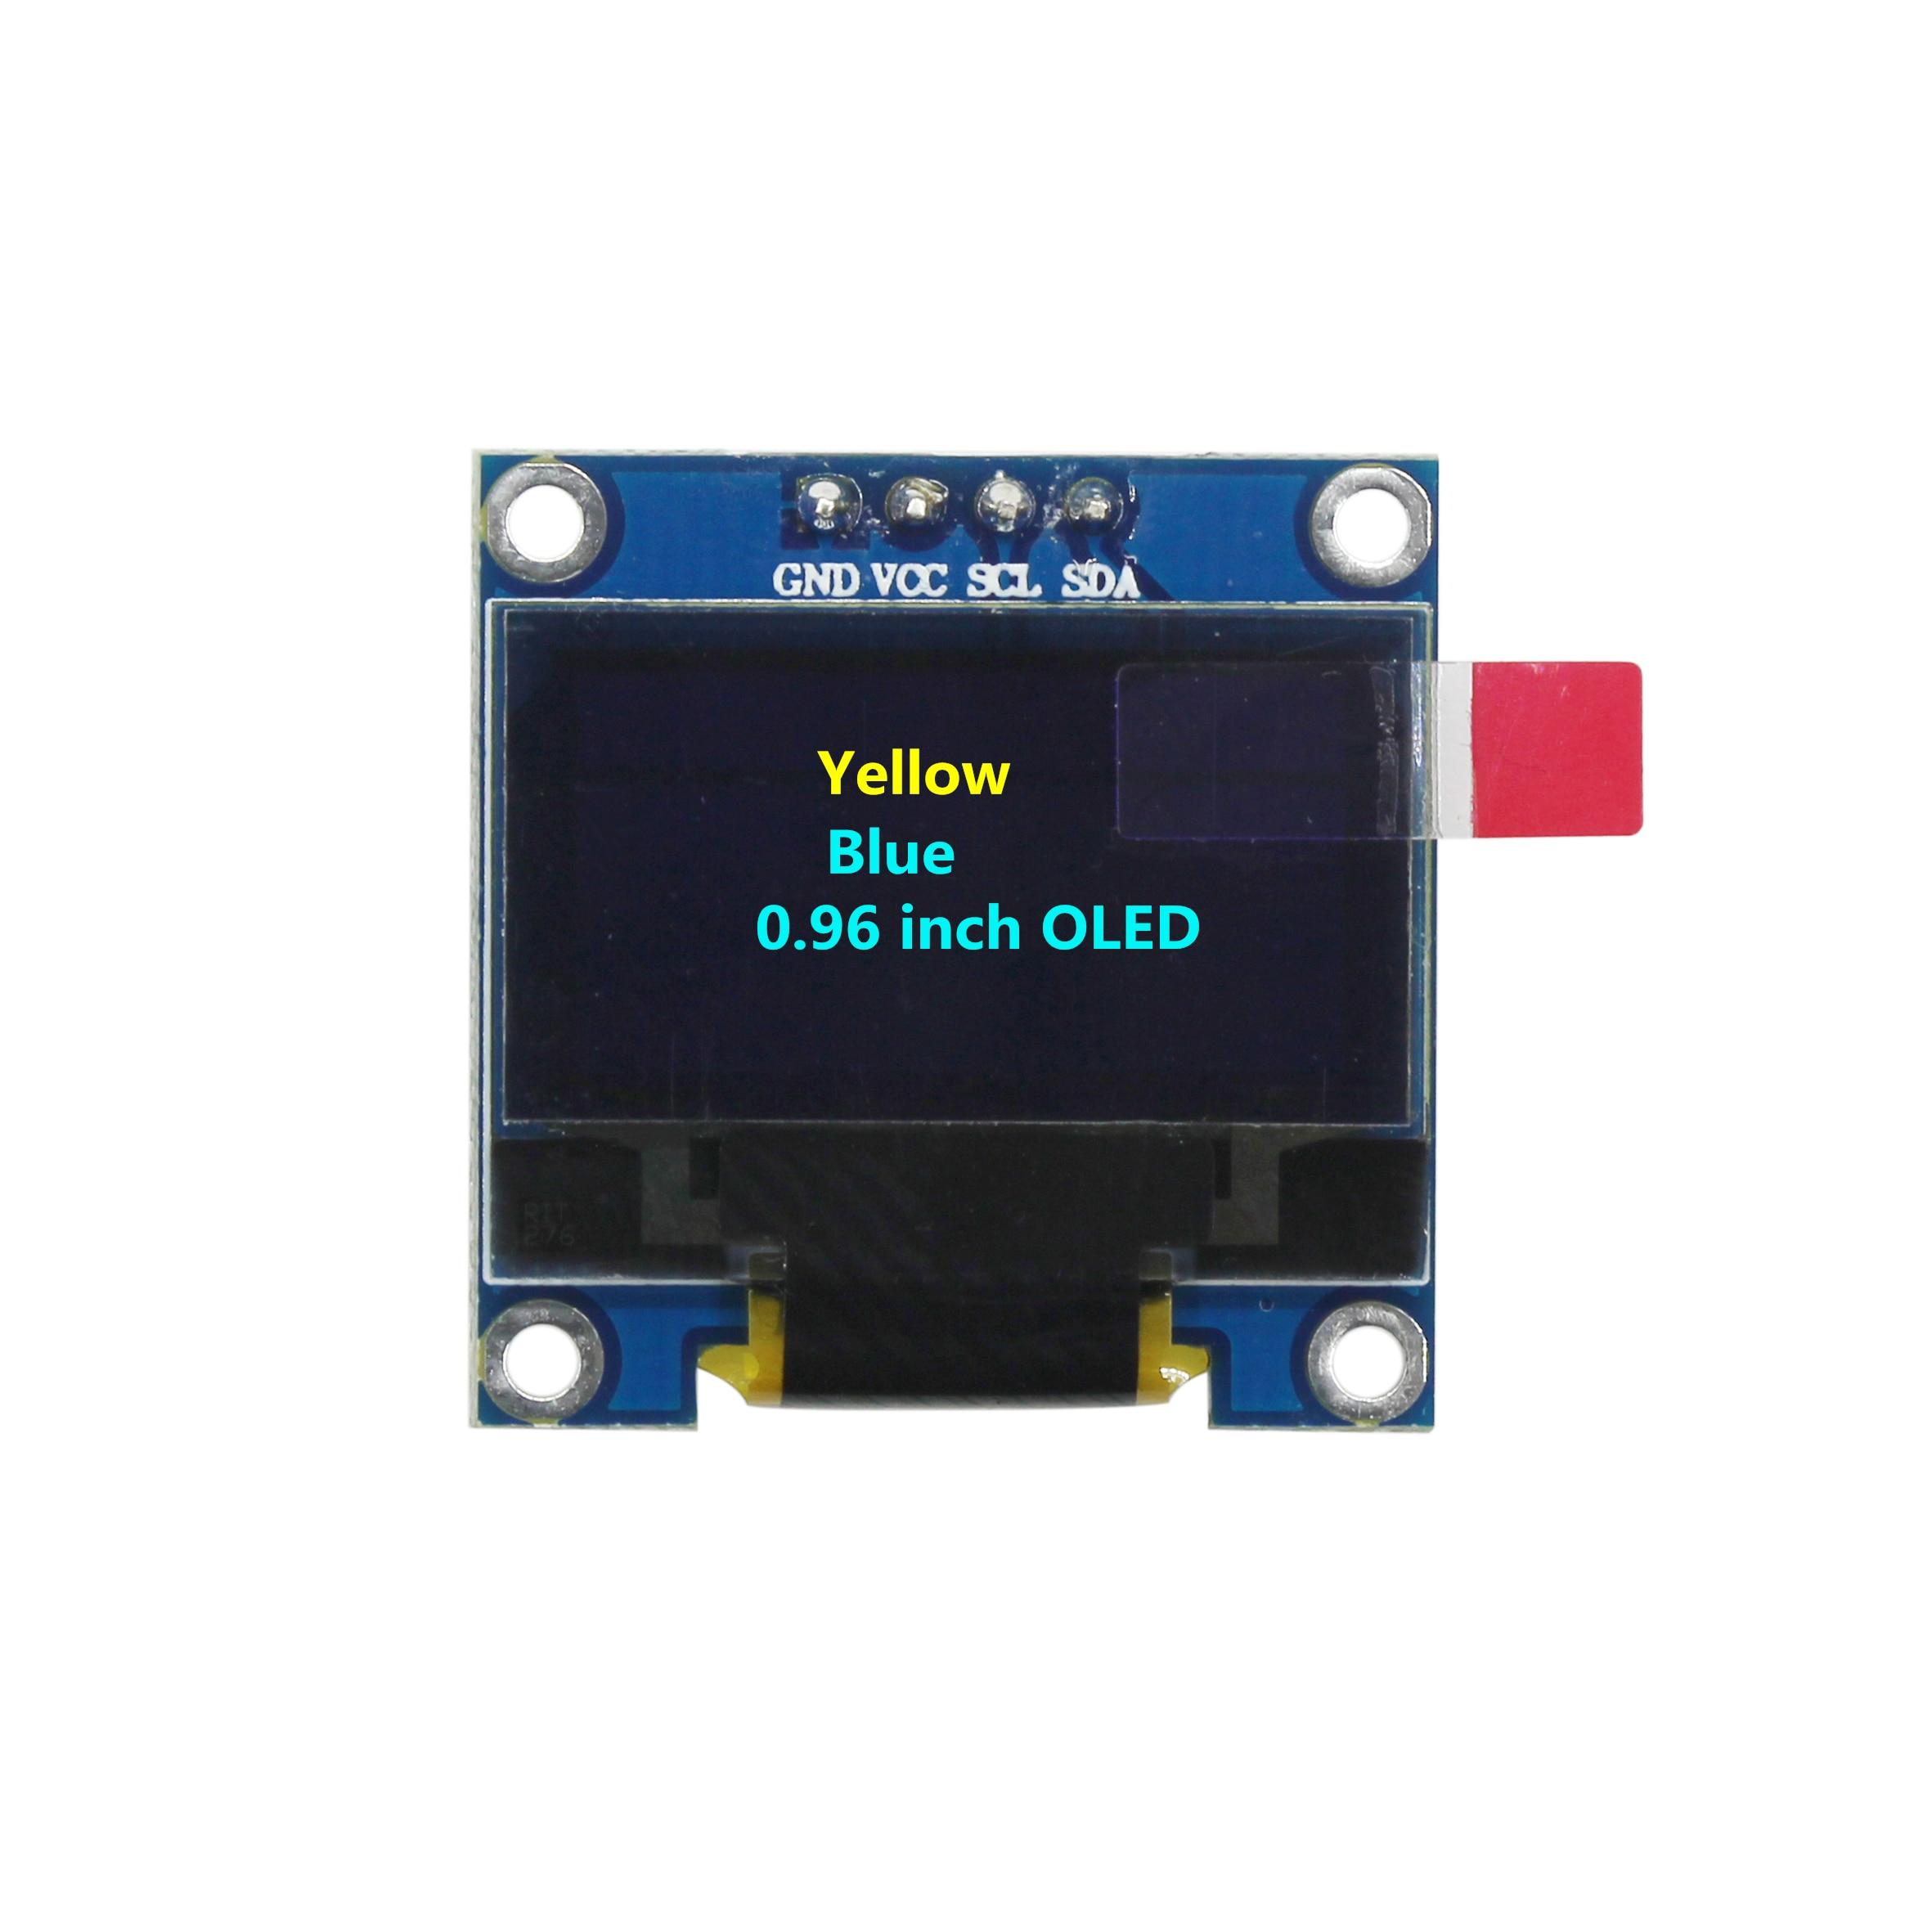 0.96 Inch 128X64 OLED Yellow Blue/Blue/White Display Module 0.96 IIC Communicate For Arduino DIY Kit